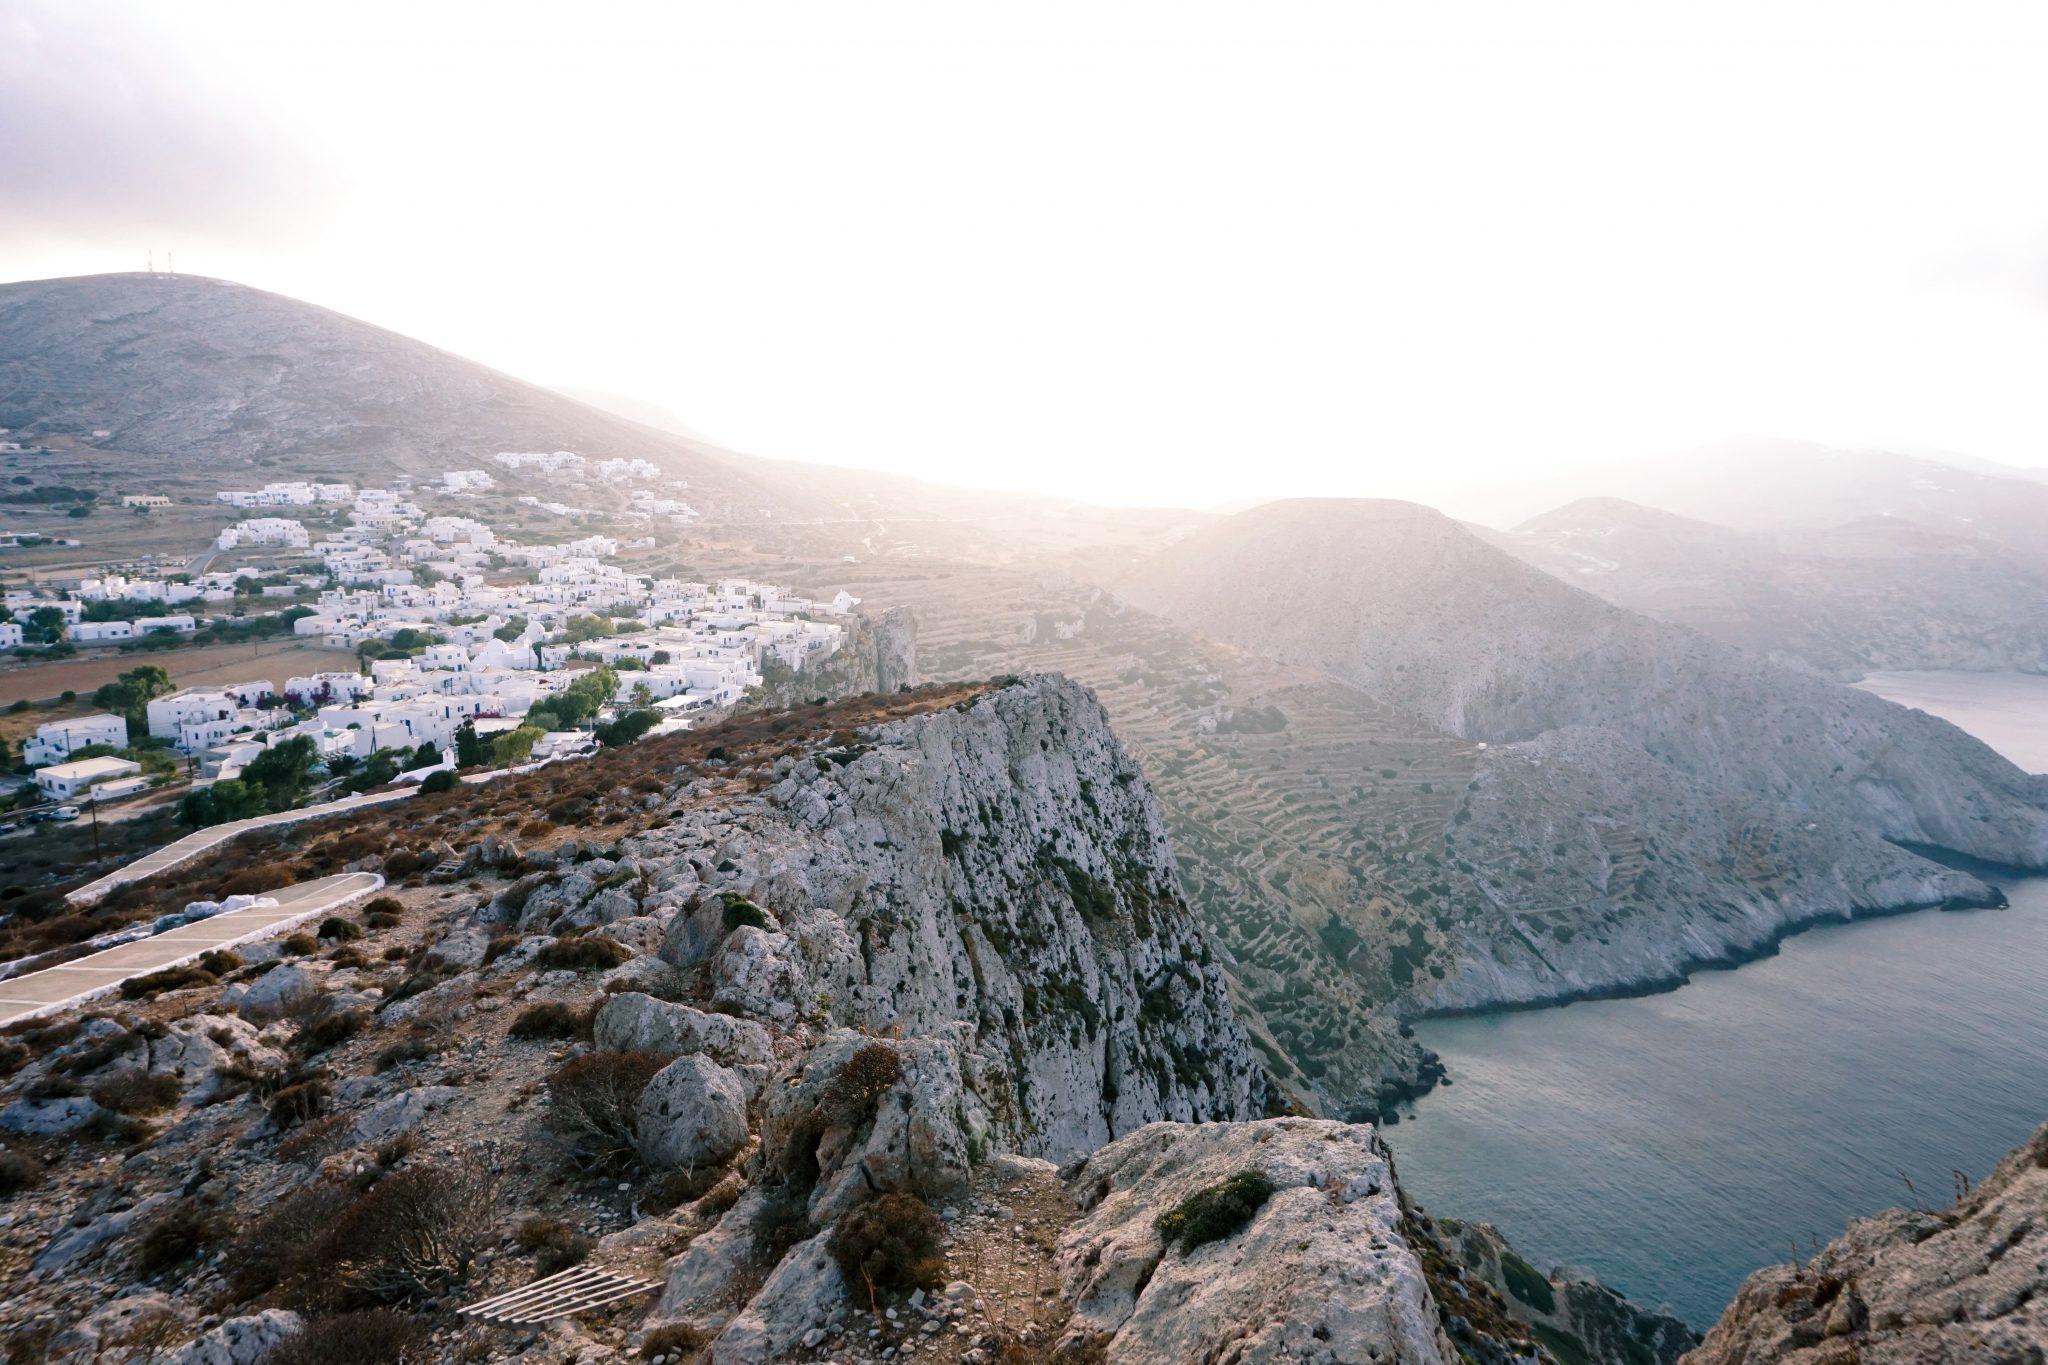 sunset, Chora, Folegandros, Greece